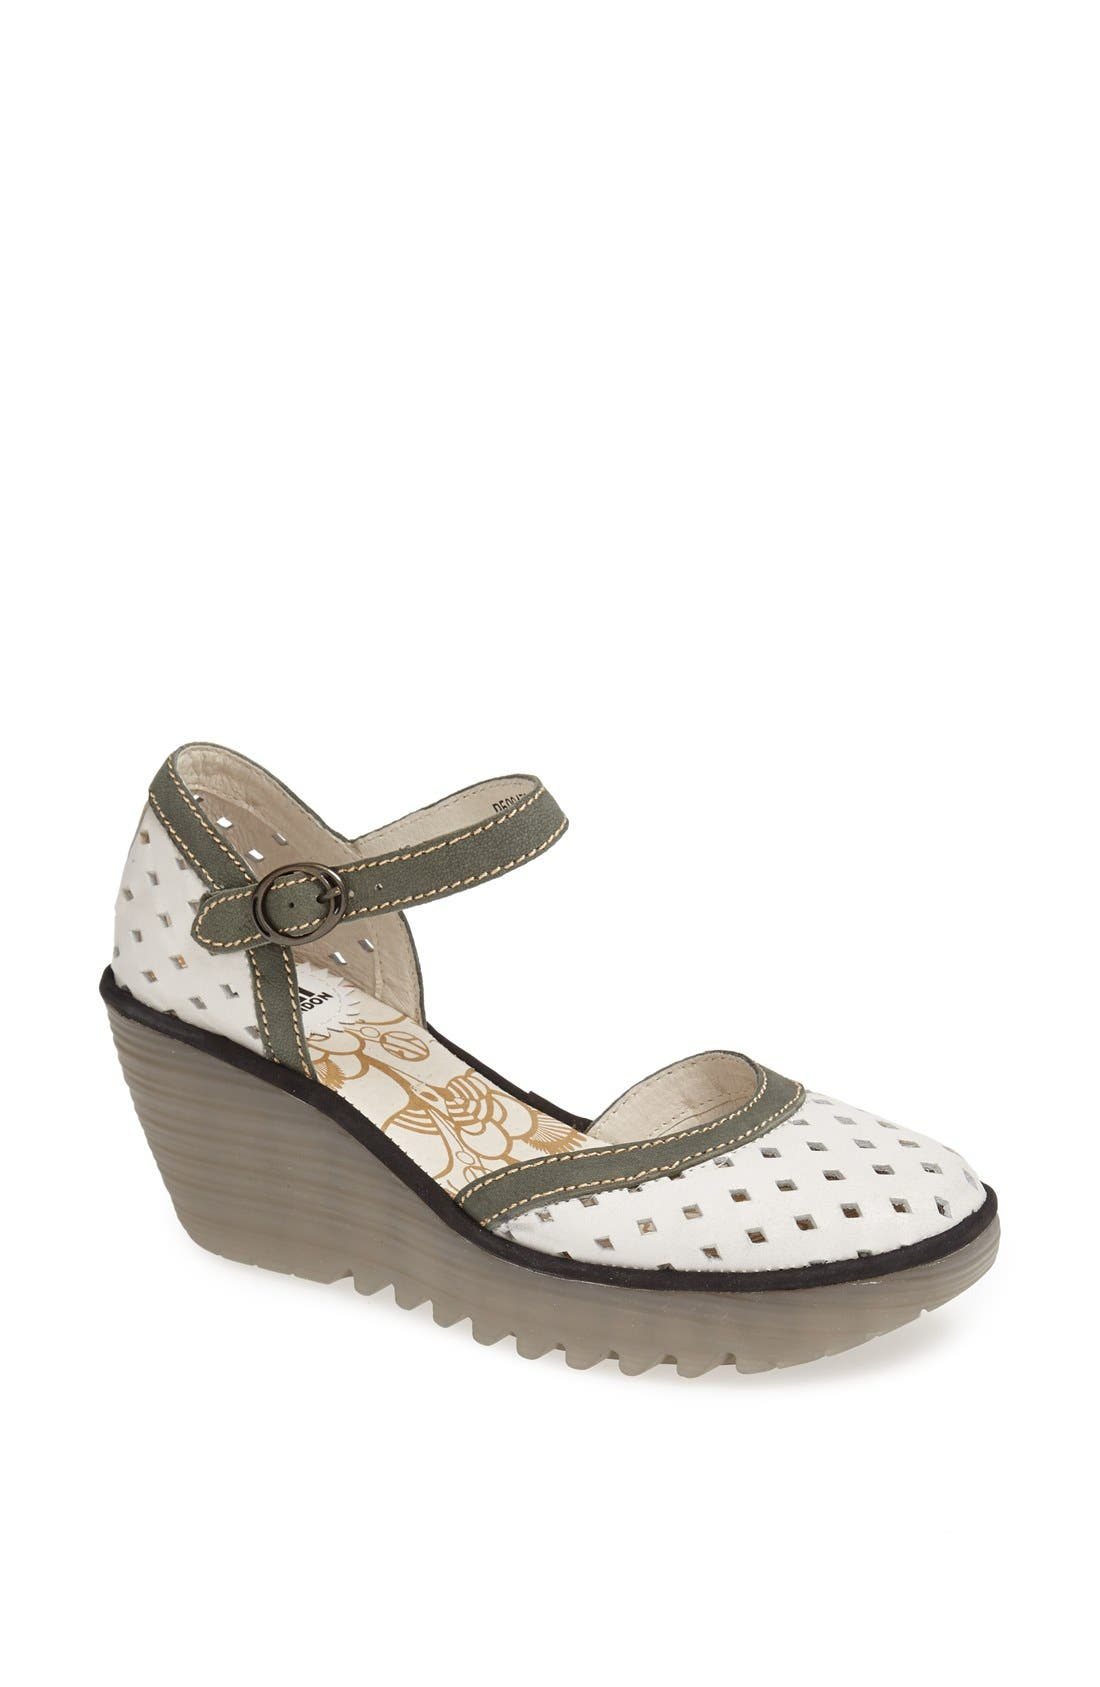 Alternate Image 1 Selected - Fly London 'Yana' Wedge Sandal